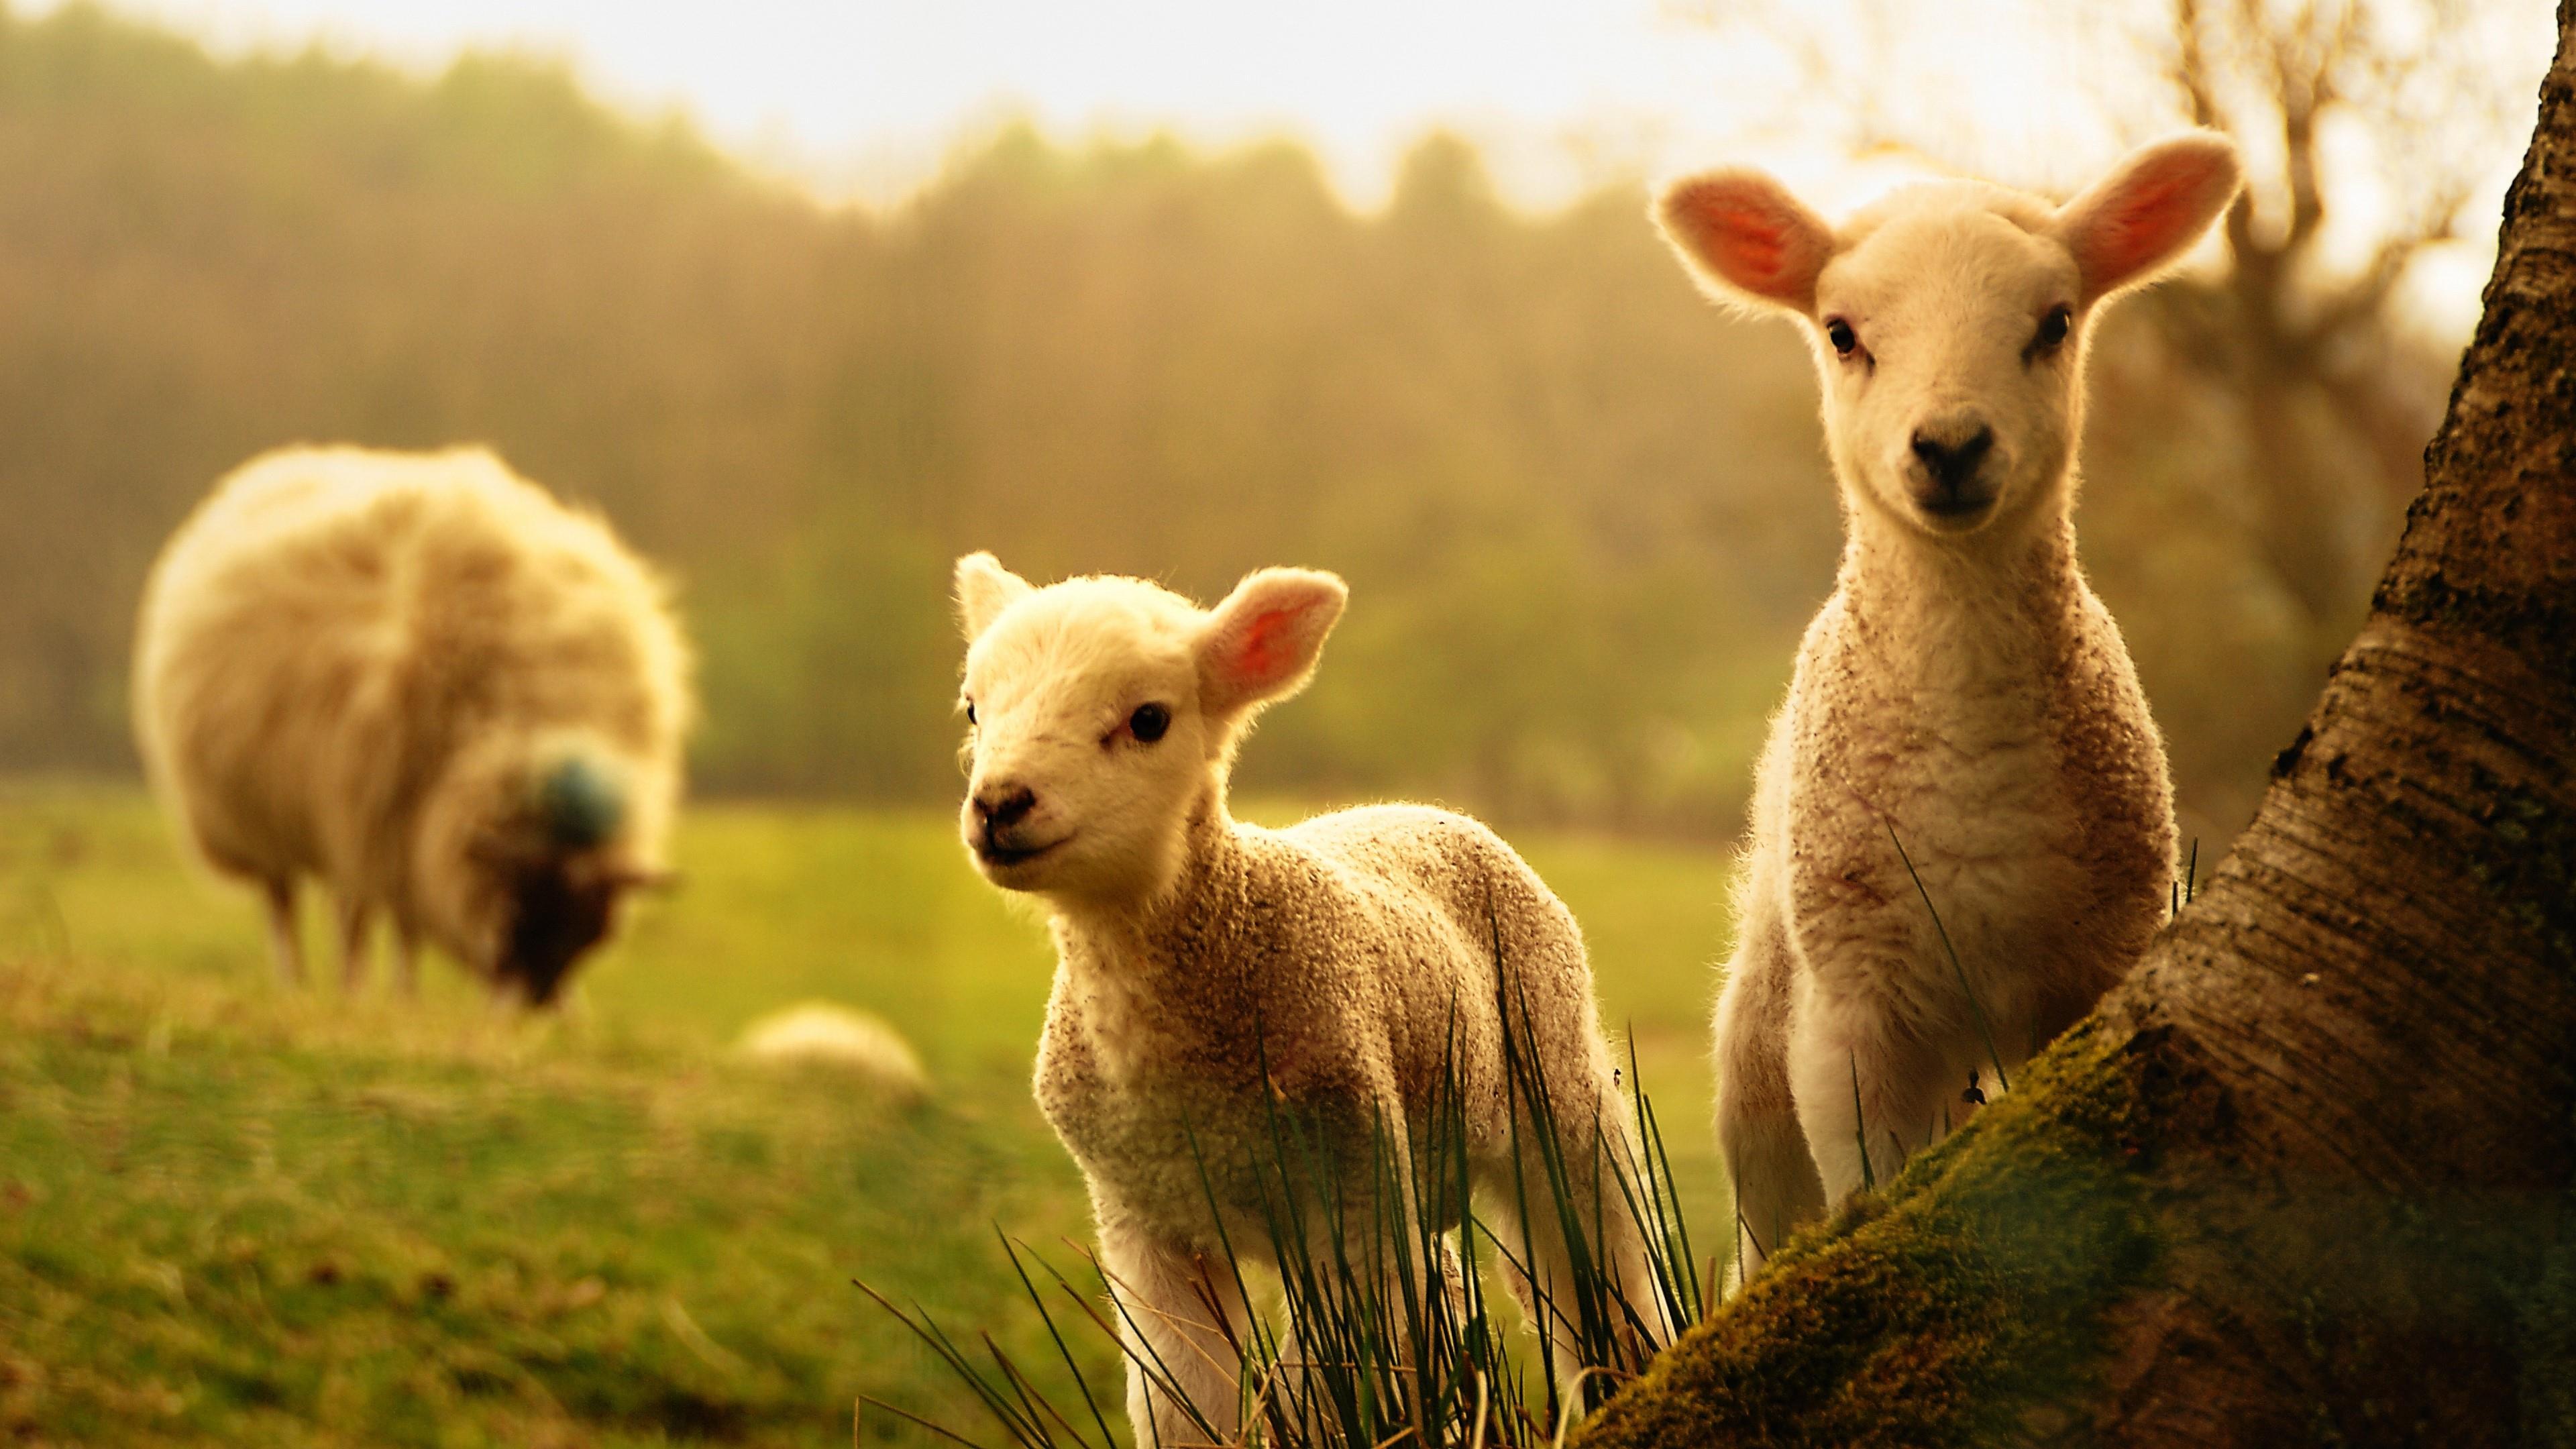 Cute baby sheep wallpaper